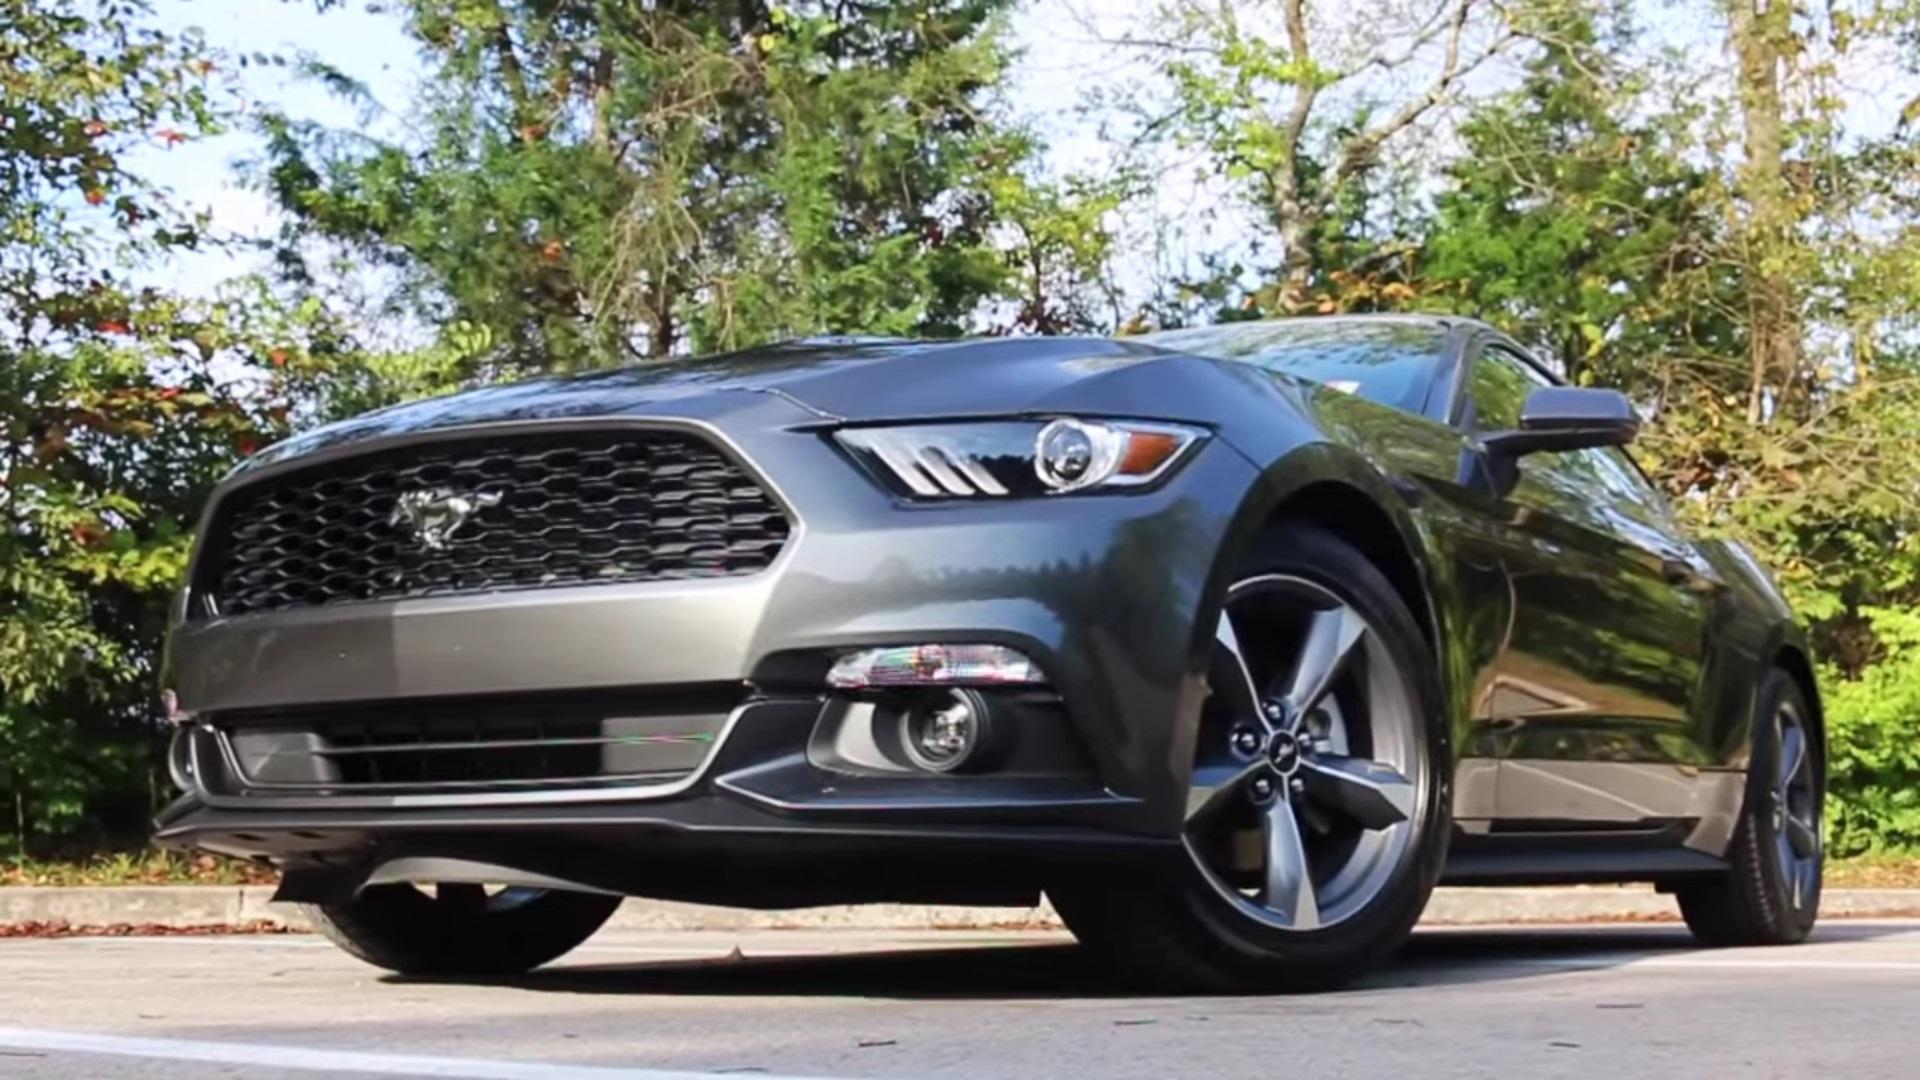 Video: 2015 Ford Mustang 3.7L V6 Cloth Interior